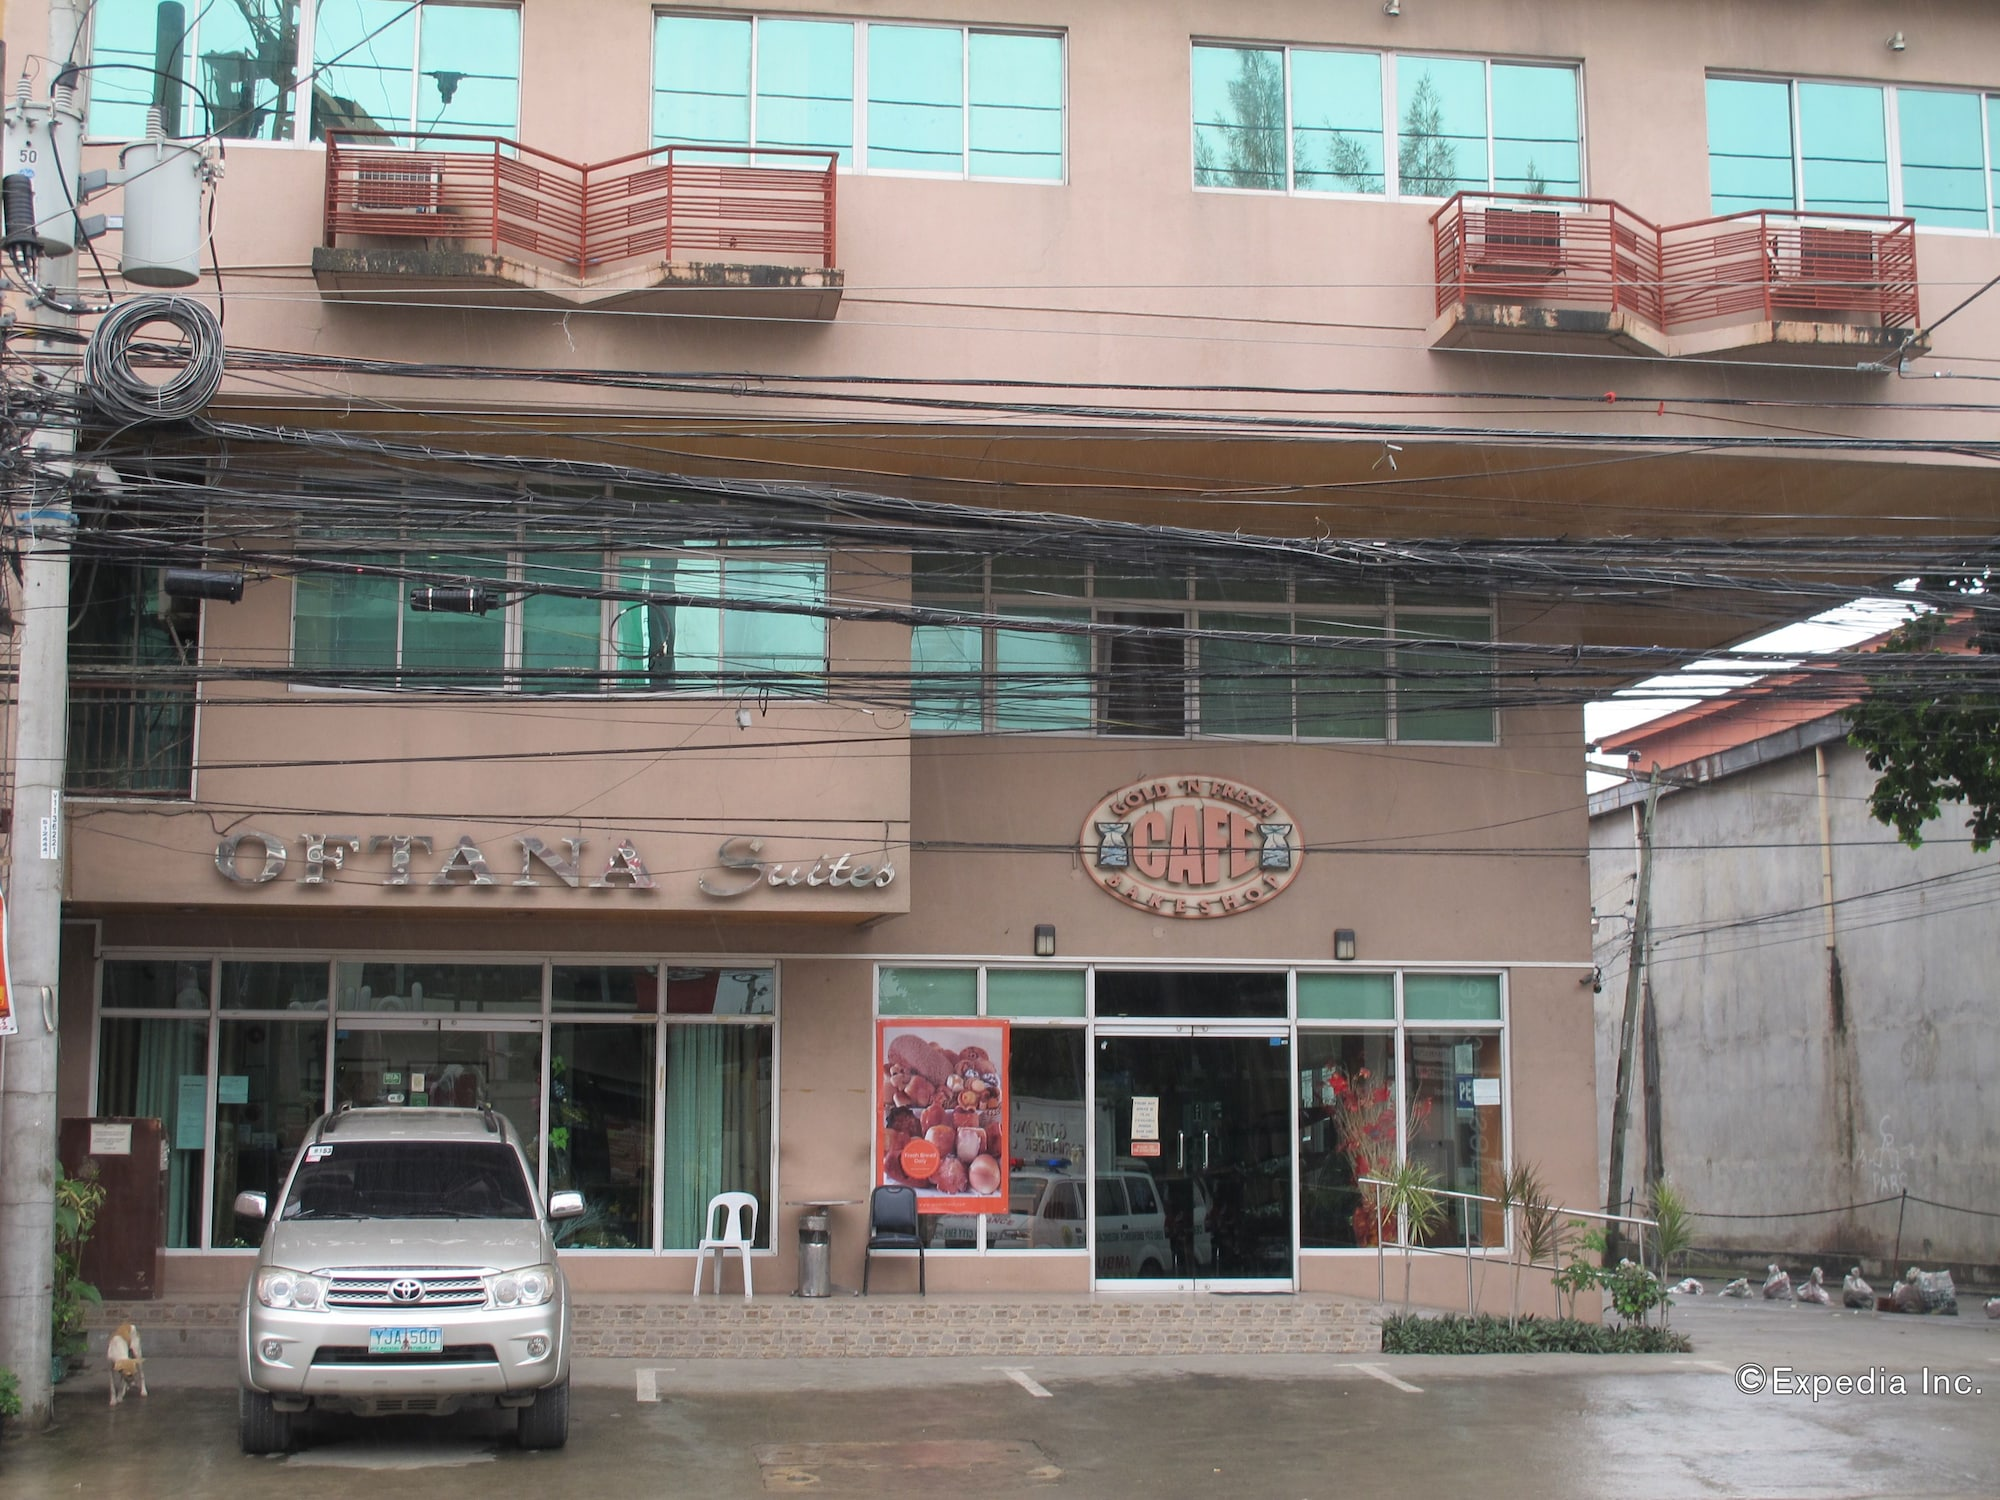 Oftana Suites, Mandaue City